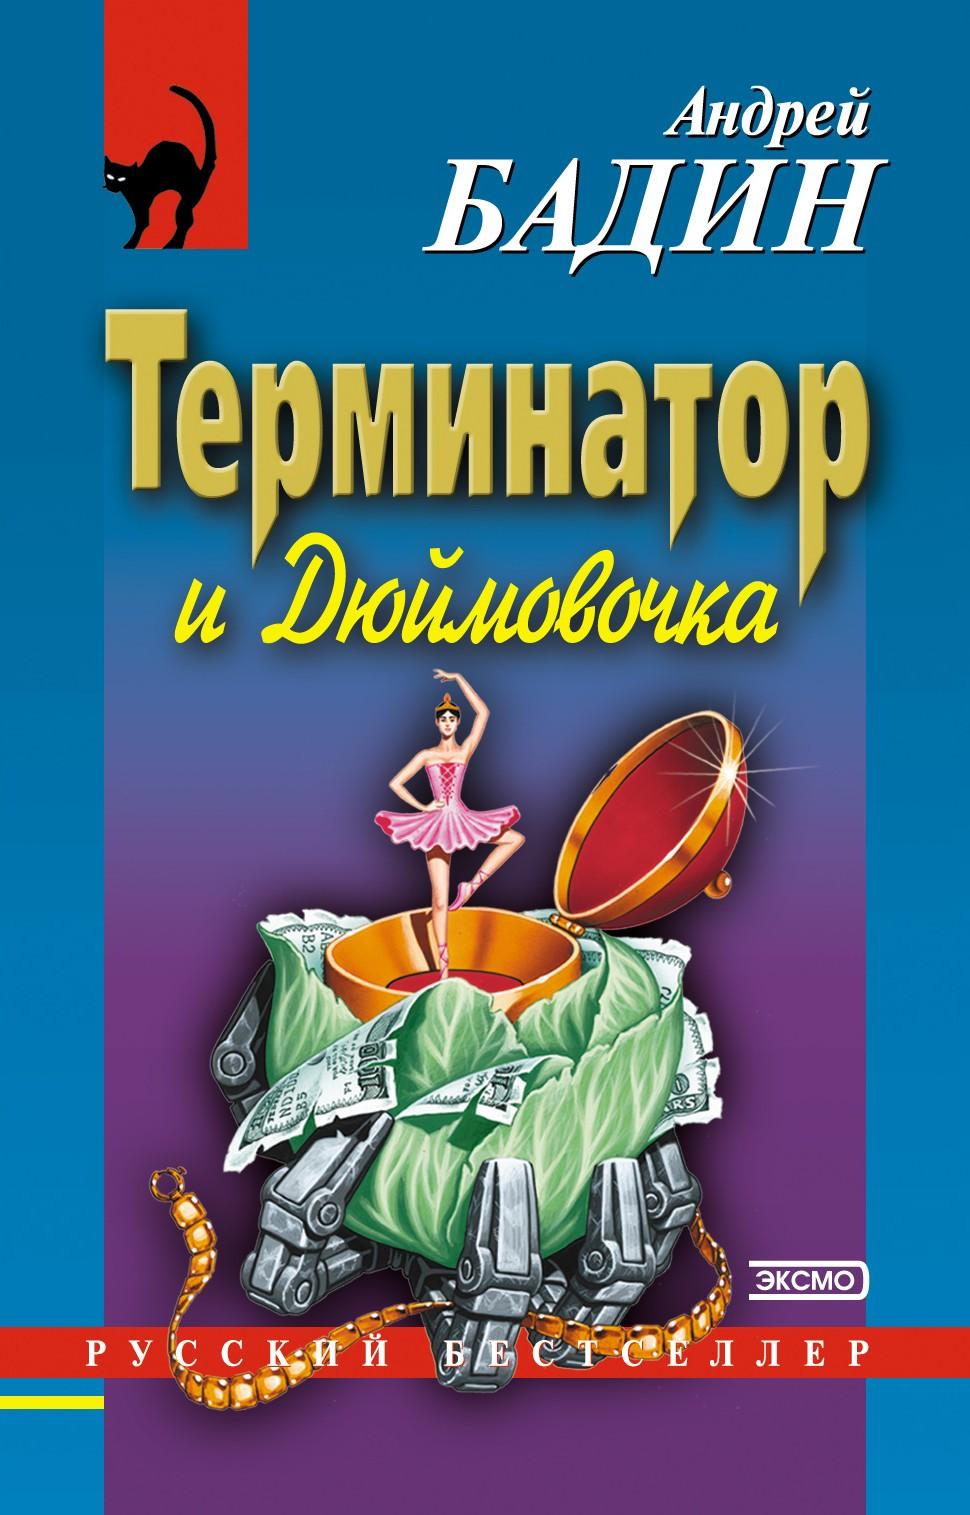 Фото - Андрей Бадин Терминатор и Дюймовочка амбьернсен ингвар самсон и роберто крутые ребята